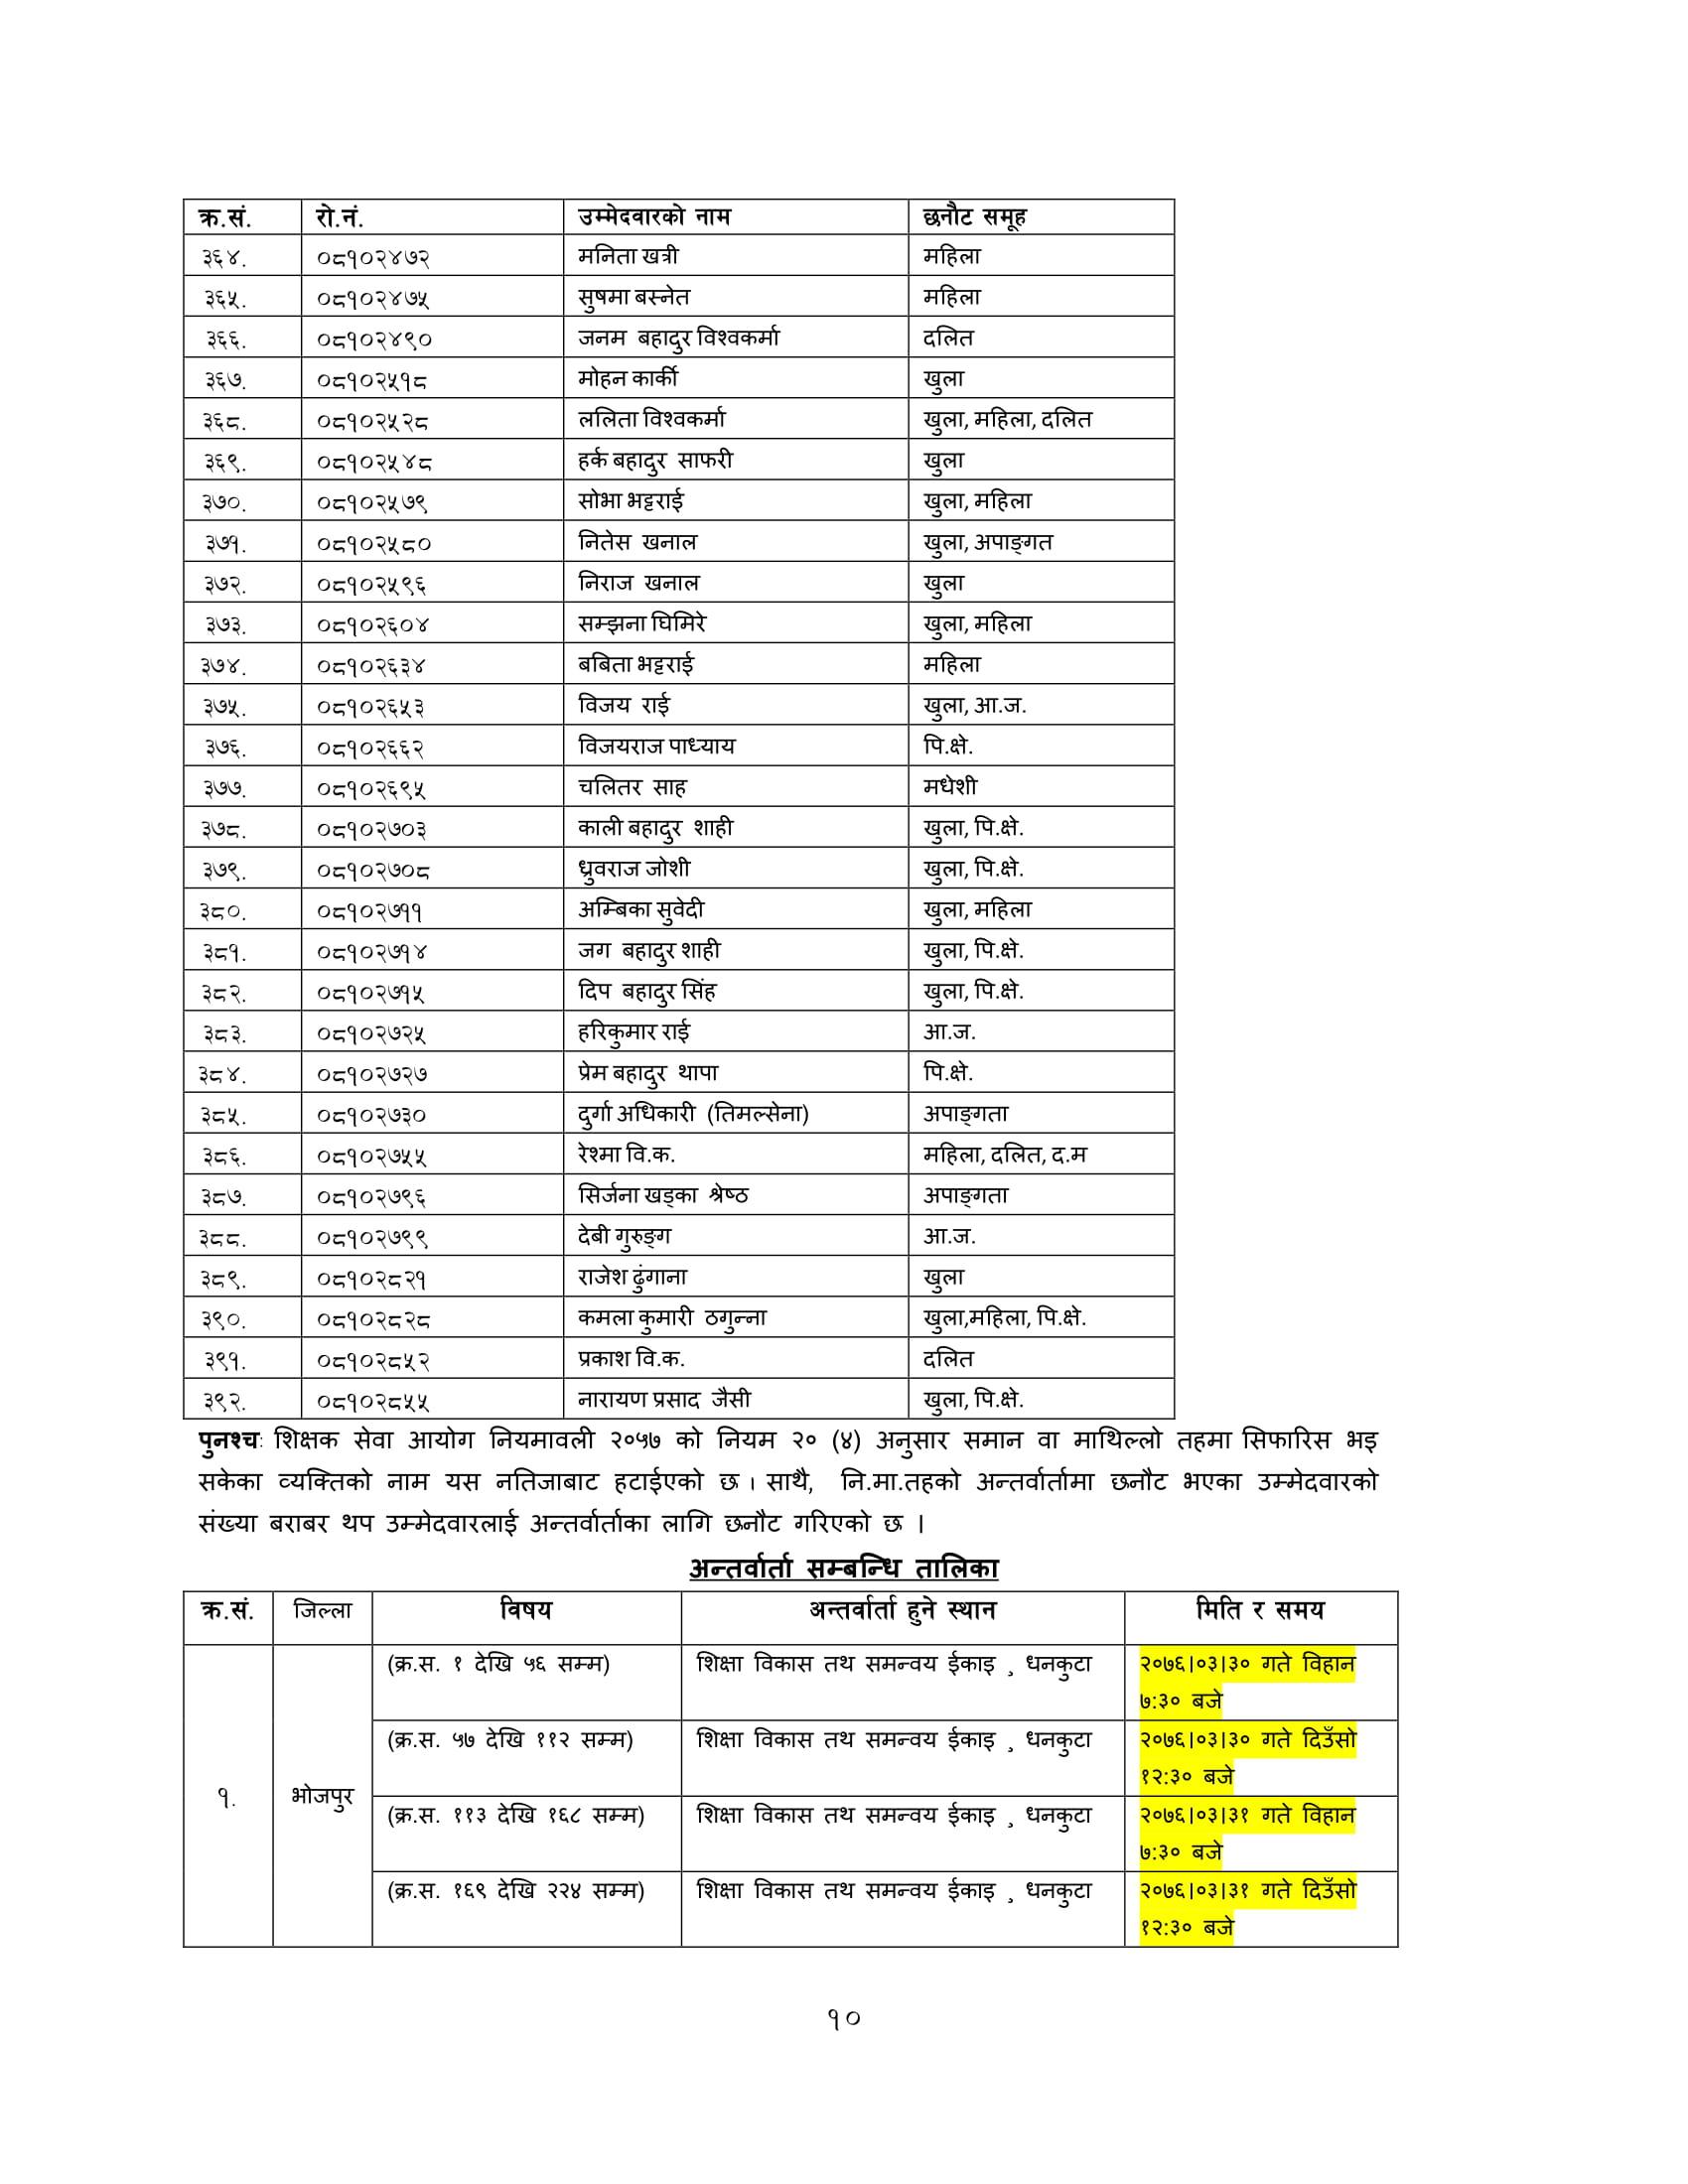 Primary Level Result, Primary Level Result 2076, Primary Level Result 2075, tsc Primary Level Result, commision on teacher credentialing, TSC exam result darchula,TSC result darchula,TSC exam result darchula,TSC result darchula,TSC open exam result ,TSC open result ,TSC open exam result ,TSC open result ,shikshak sewa aayog 2075 primary level result,shikshak sewa aayog 2075 result, shikshak sewa aayog result primary level, shikshak sewa aayog 2075 result, www.tsc.gov.np 2075 primary level result,www.tsc.gov.np.com 2075,tsc.gov.np result 2075,www.tsc.gov.np result 2076,www tsc result 2075,2075 TSC exam result ,2075 TSC Result,Online Result TSC Nepal , shikshak sewa aayog natija,TSC exam result ,TSC internal exam result, TSC Nepal 2075 Internal Exam Result ,TSC Nepal result,TSC Online Result ,tsc result,primary level result,shikshak sewa aayog result, shikshak sewa result, shikshak sewa natija , shikshak sewa Aayog natija 2075 , shikshak sewa natija 2075, Shikshak Sewa Aayog Result, Shikshak Sewa Aayog Result 2075, Shikshak Sewa Result,